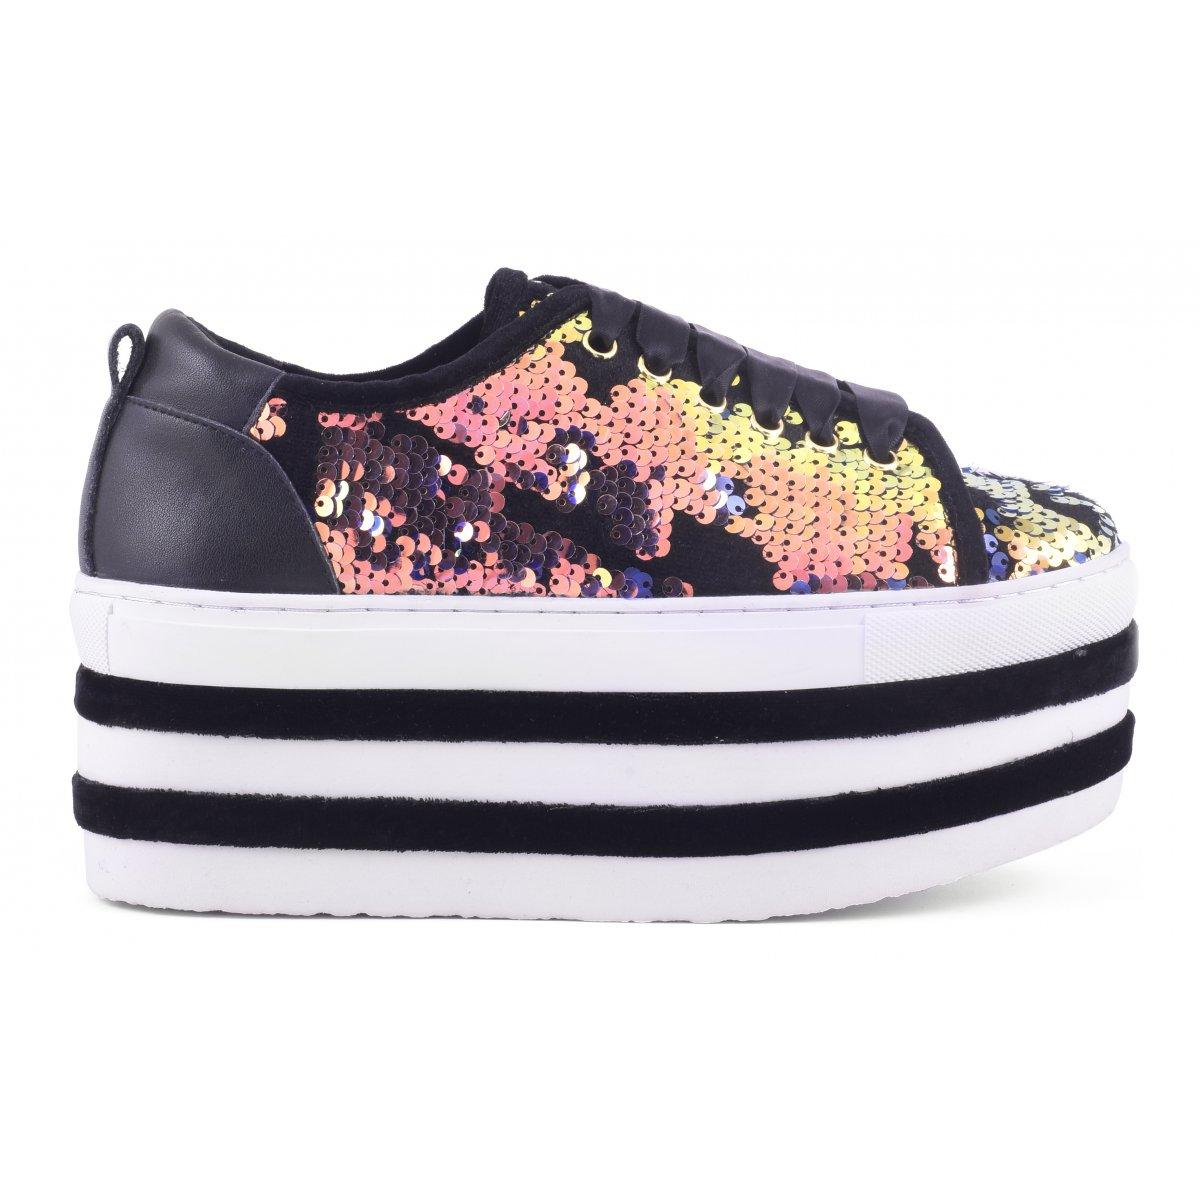 Sequins high sole sneaker - New Arrivals Colors of California Women cbe5c65199